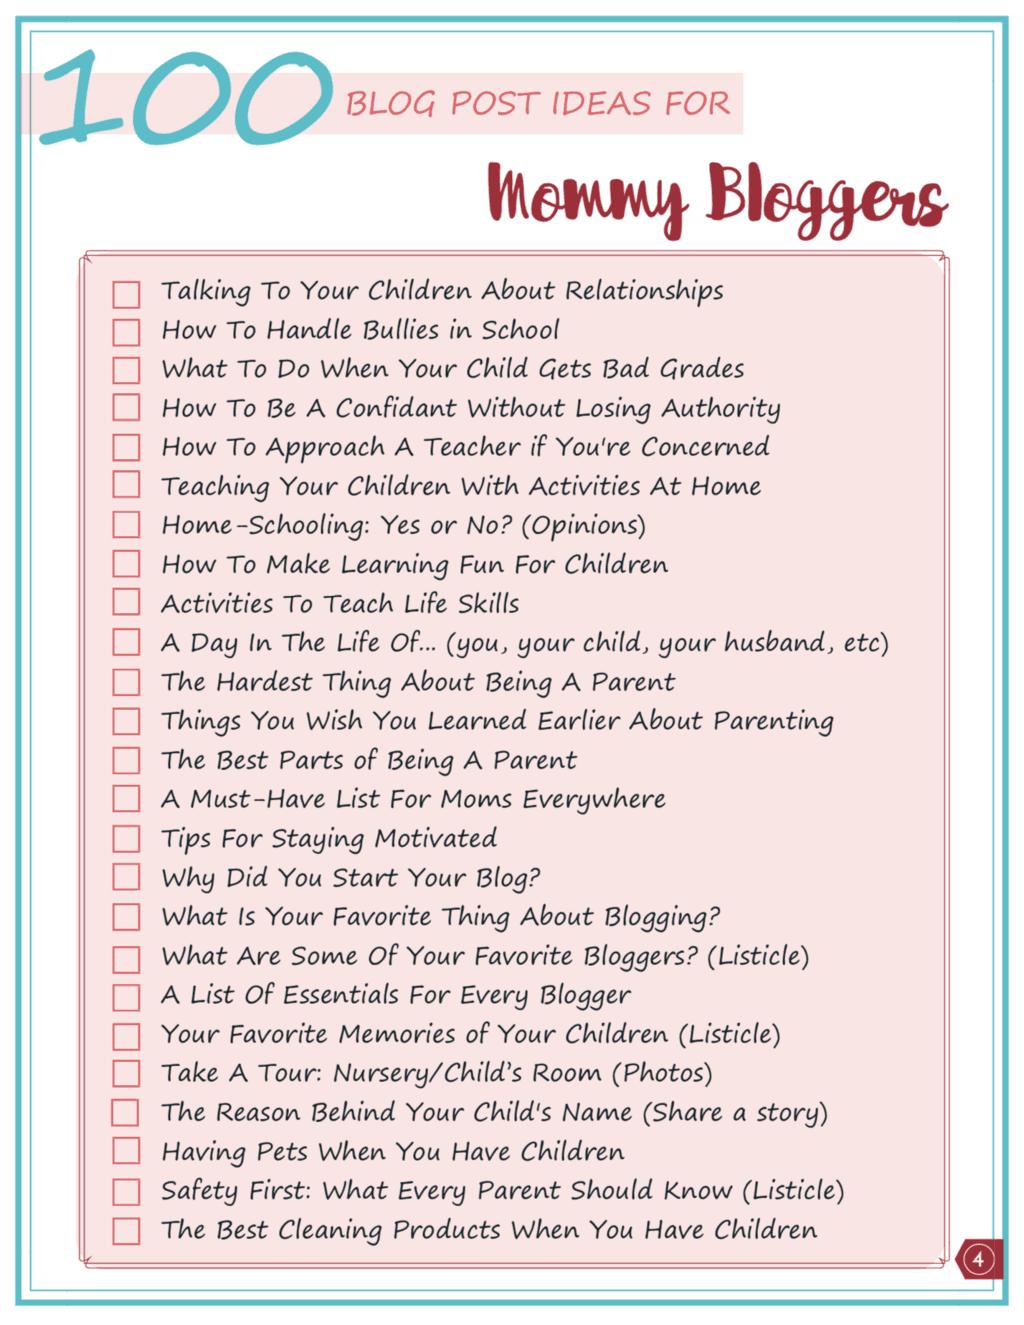 Printable checklist of 100 mom blog ideas to inspire you!